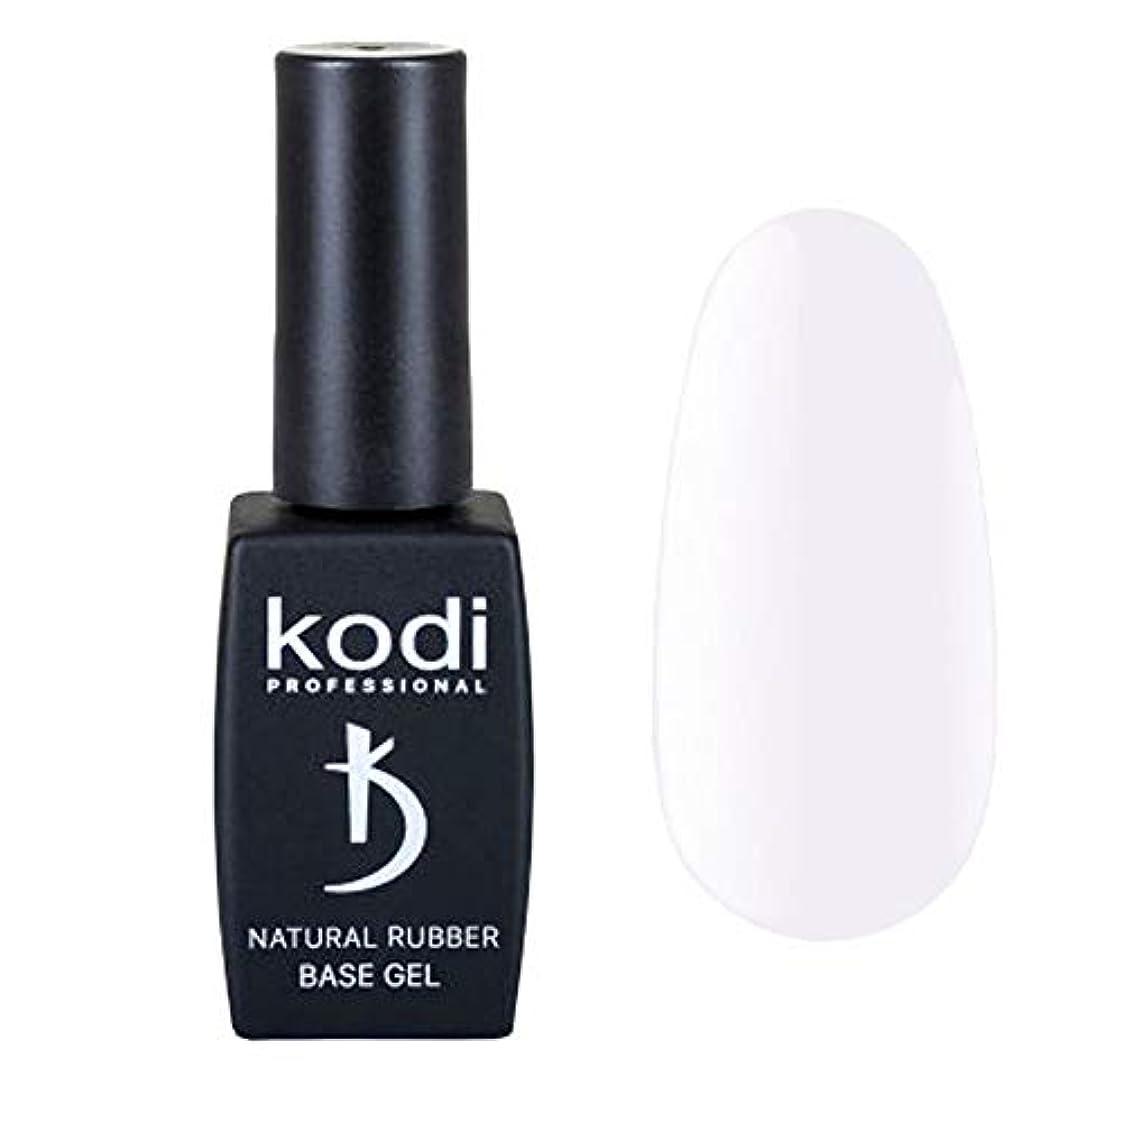 Kodi Professional New Collection BW White #10 Color Gel Nail Polish 12ml 0.42 Fl Oz LED UV Genuine Soak Off